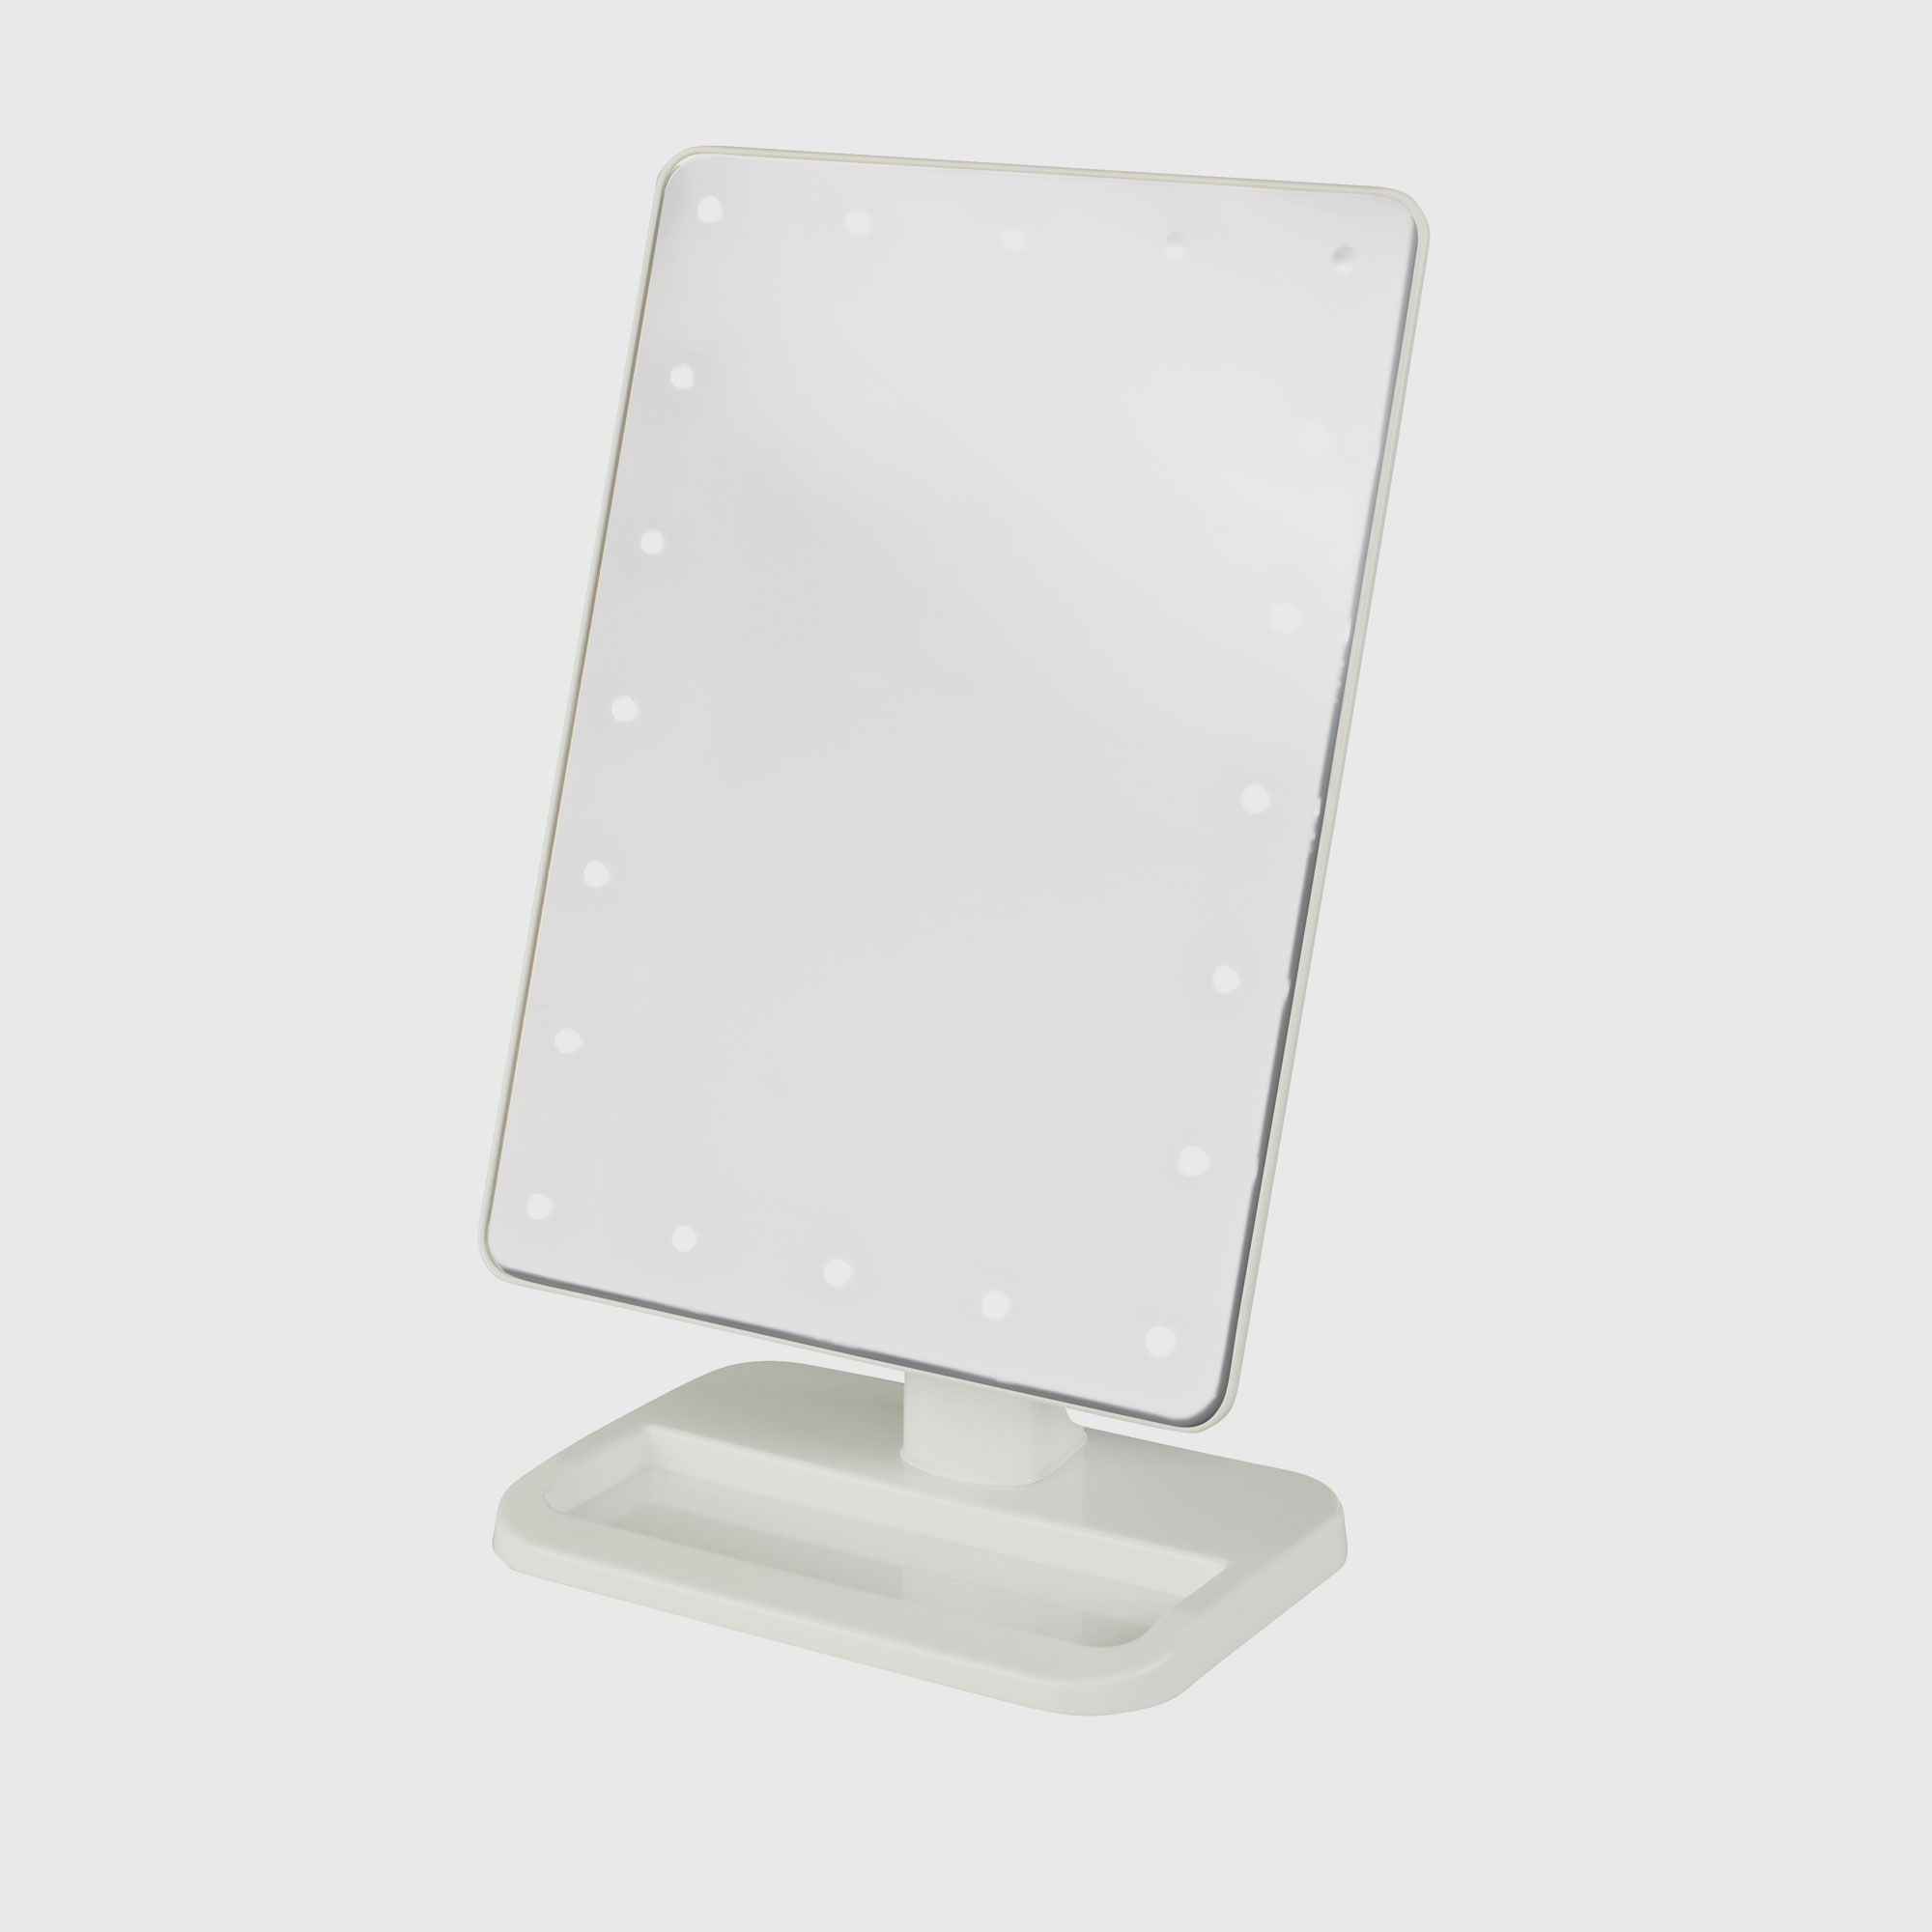 Tabletop Mirrors u0026gt; Jerdon JS811W LED Lighted Tabletop Makeup Mirror ...